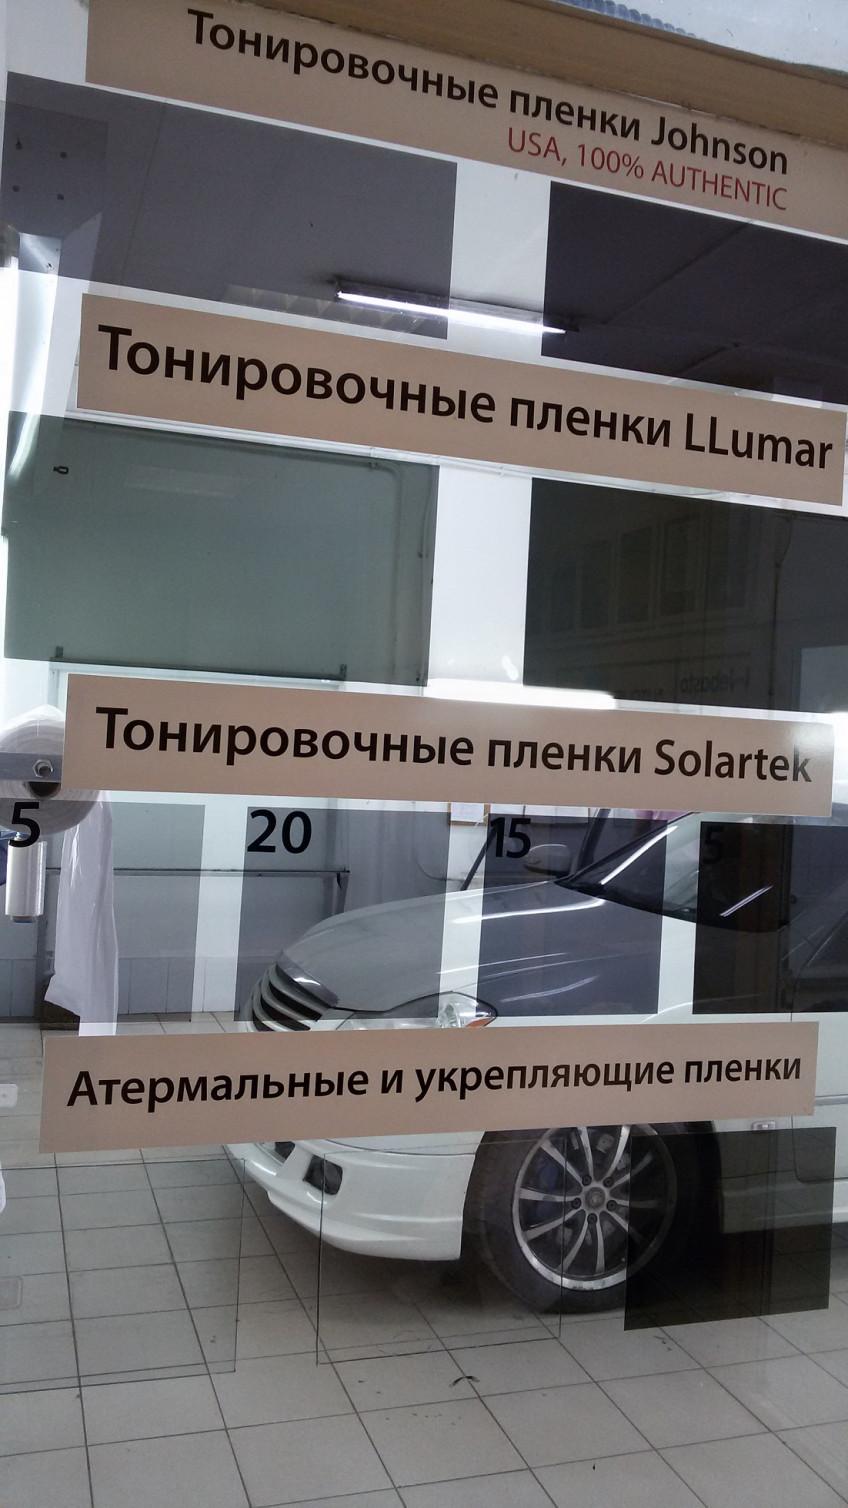 http://autostudio.ru/images/thumb/848x1508_30339.jpg